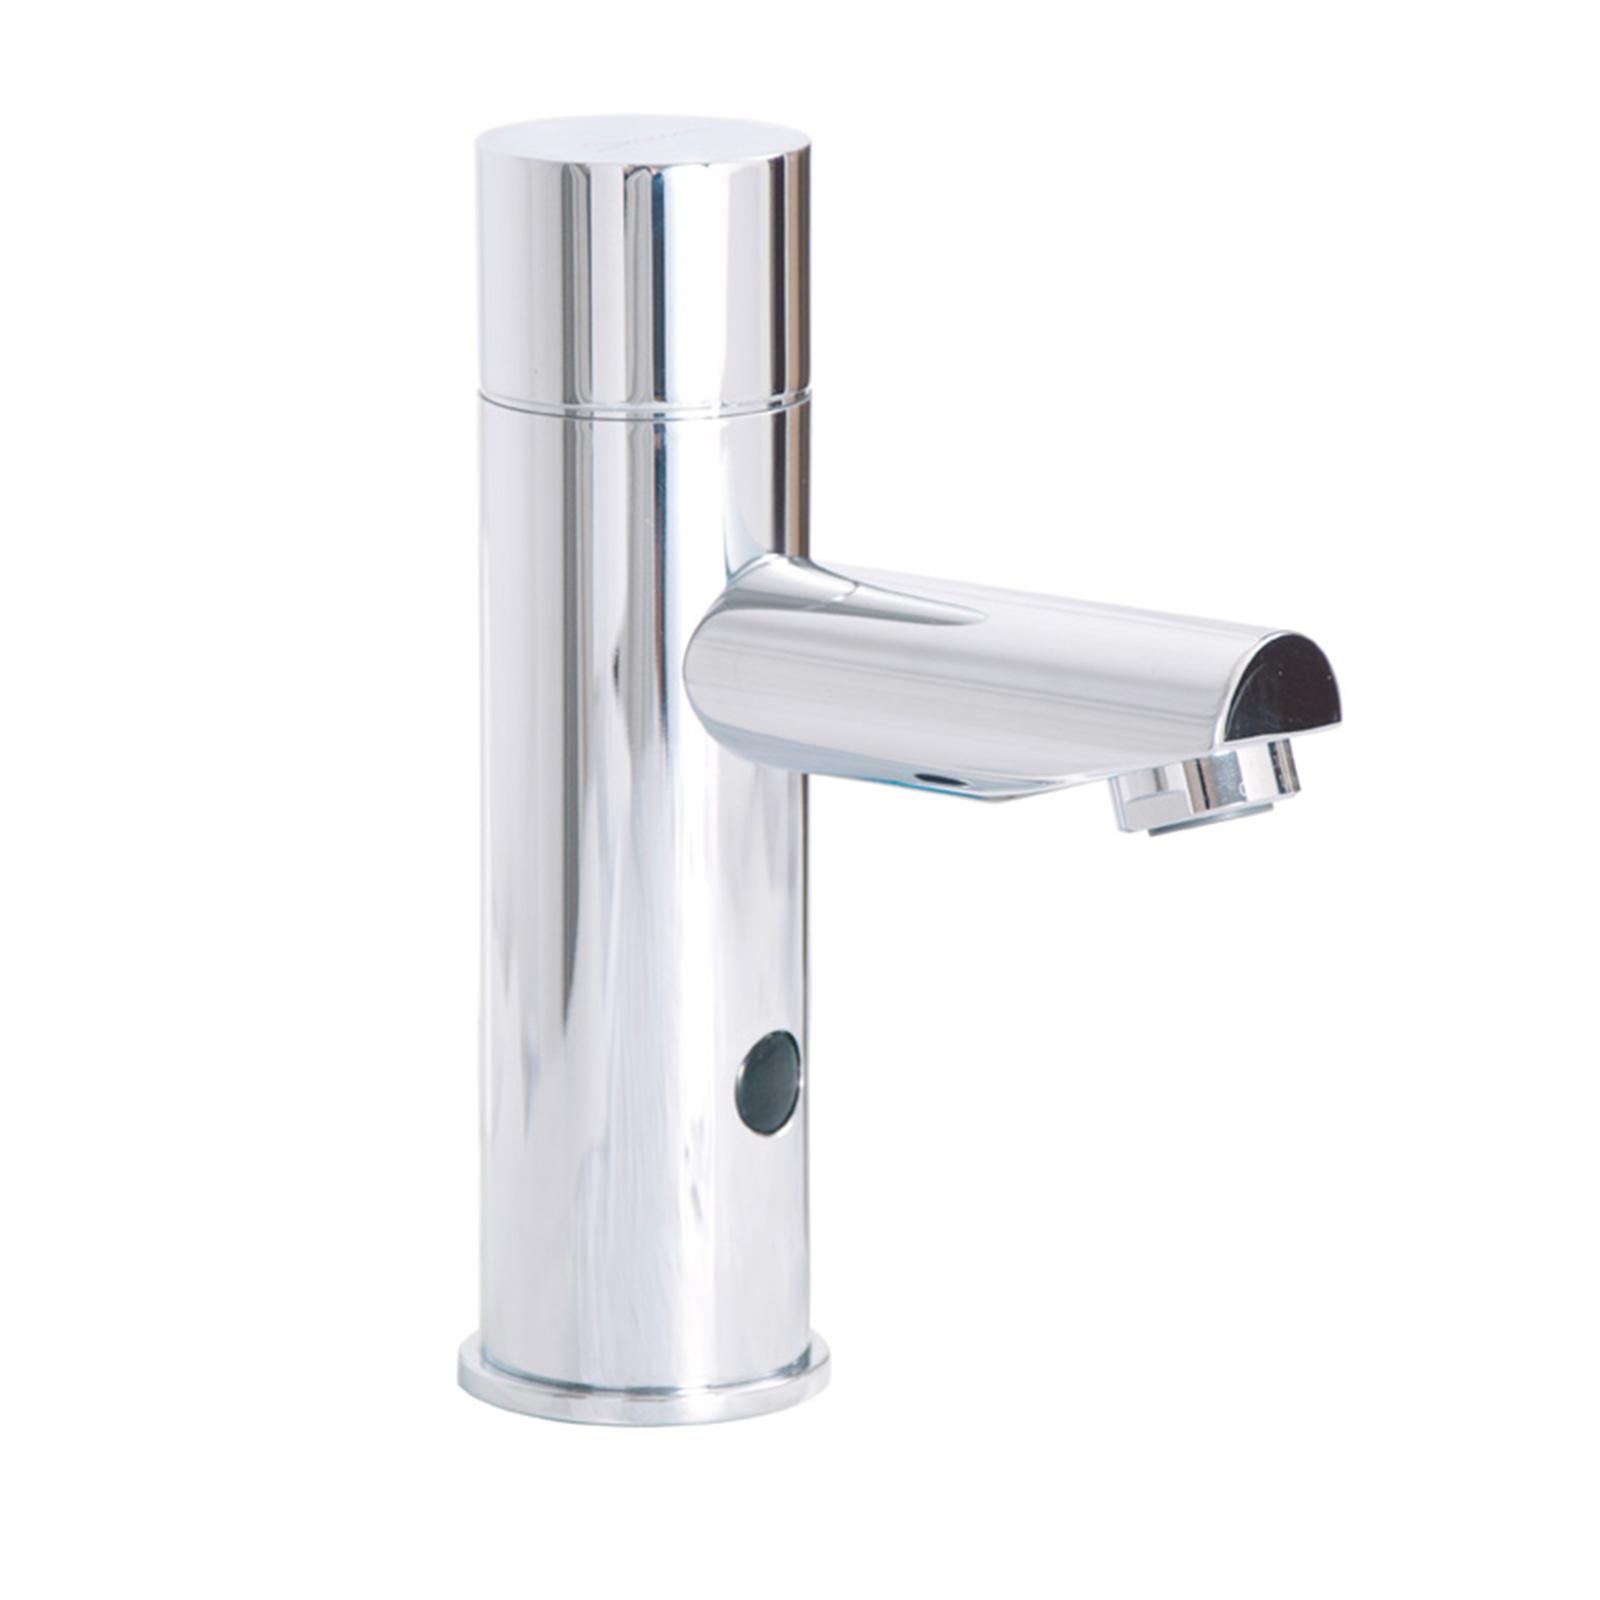 BK Resources BKF-KAI-9T-G faucet, electronic